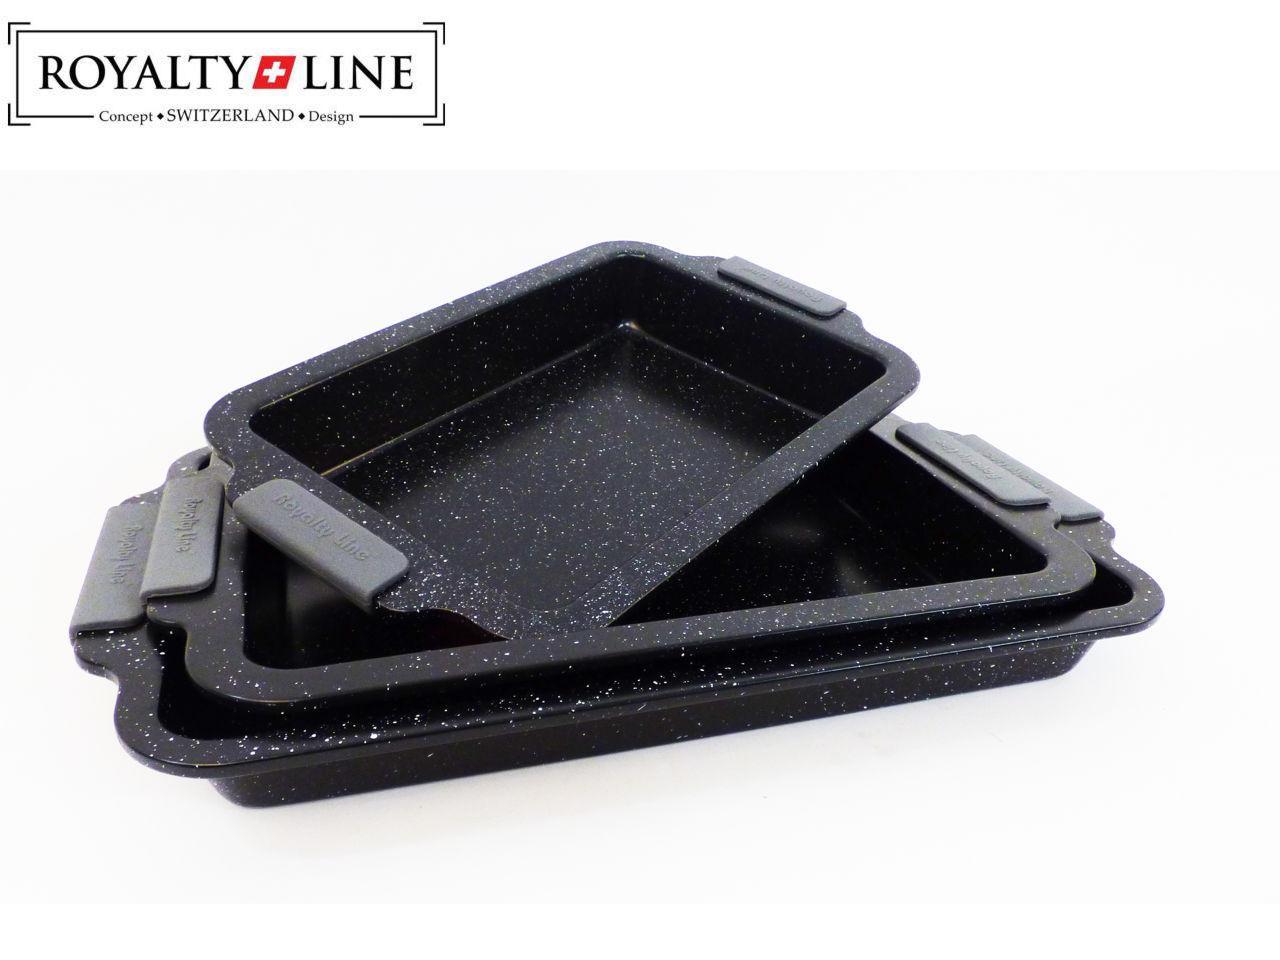 ROYALTY LINE RL-MC3 BLACK, 3 ks | CHAT on-line podpora PO-PÁ 8-22.00!!